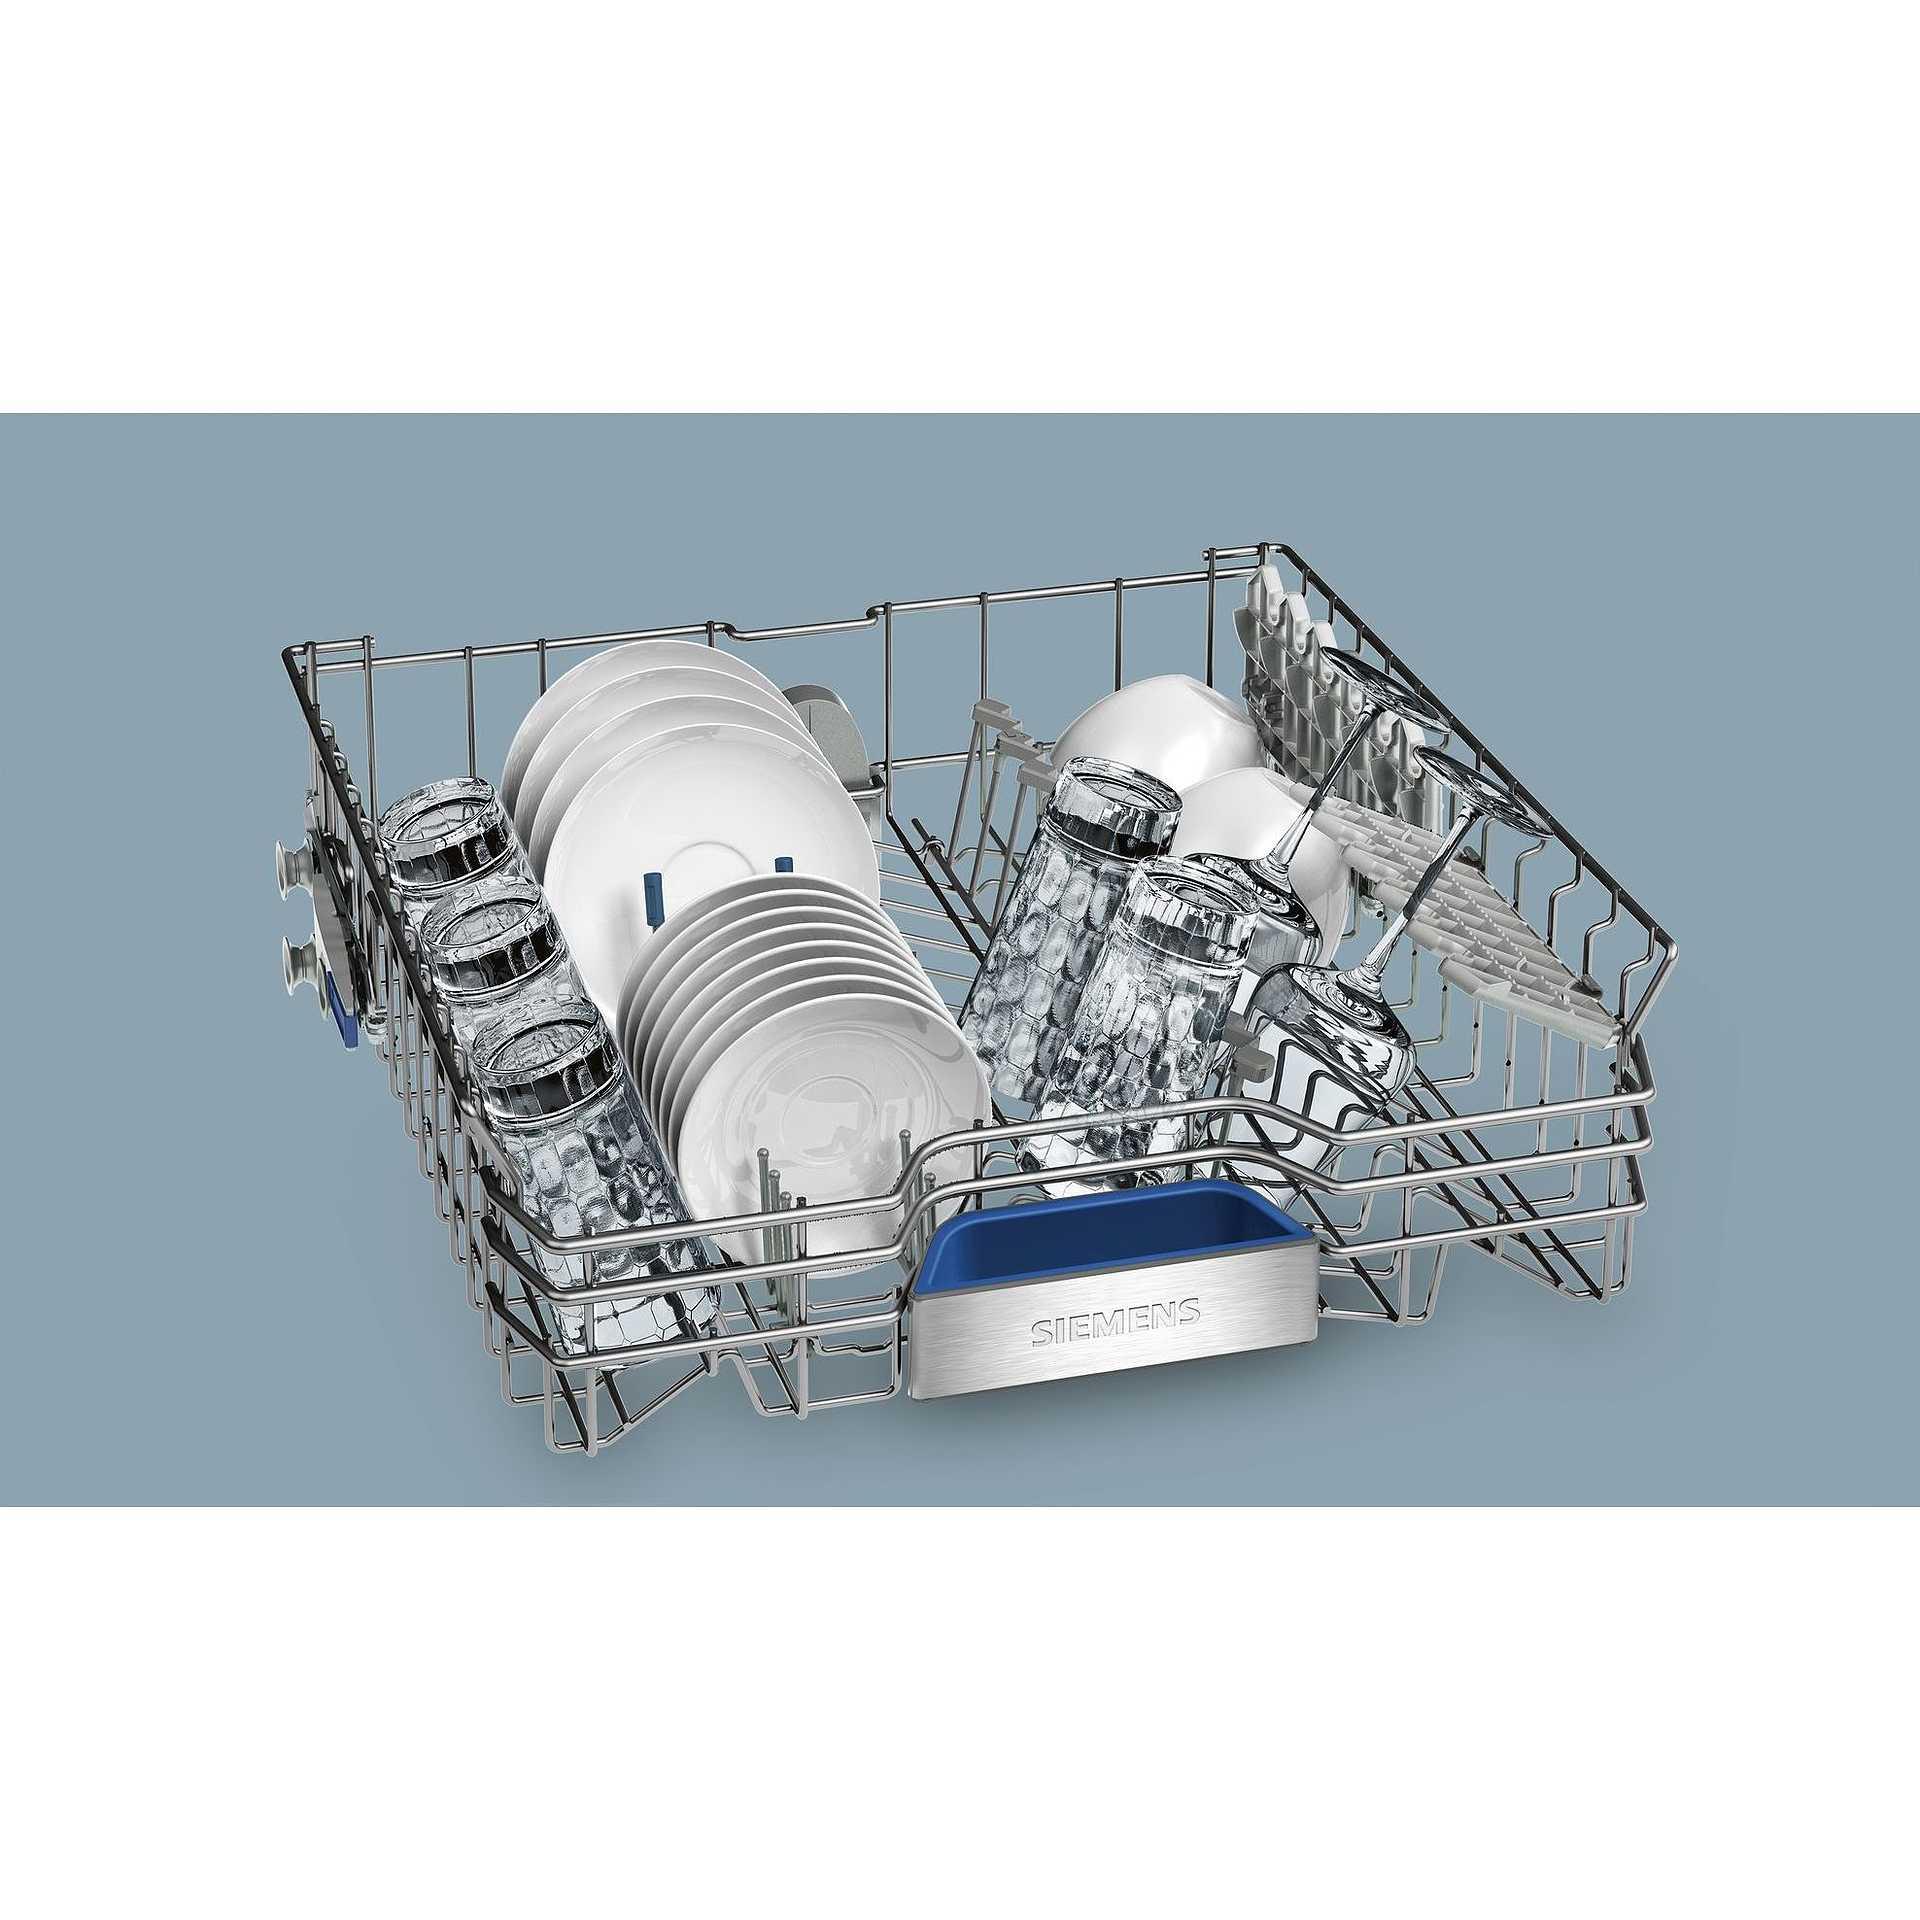 SN66M099EU Siemens lavastoviglie da incasso 60 cm 14 coperti Classe ...